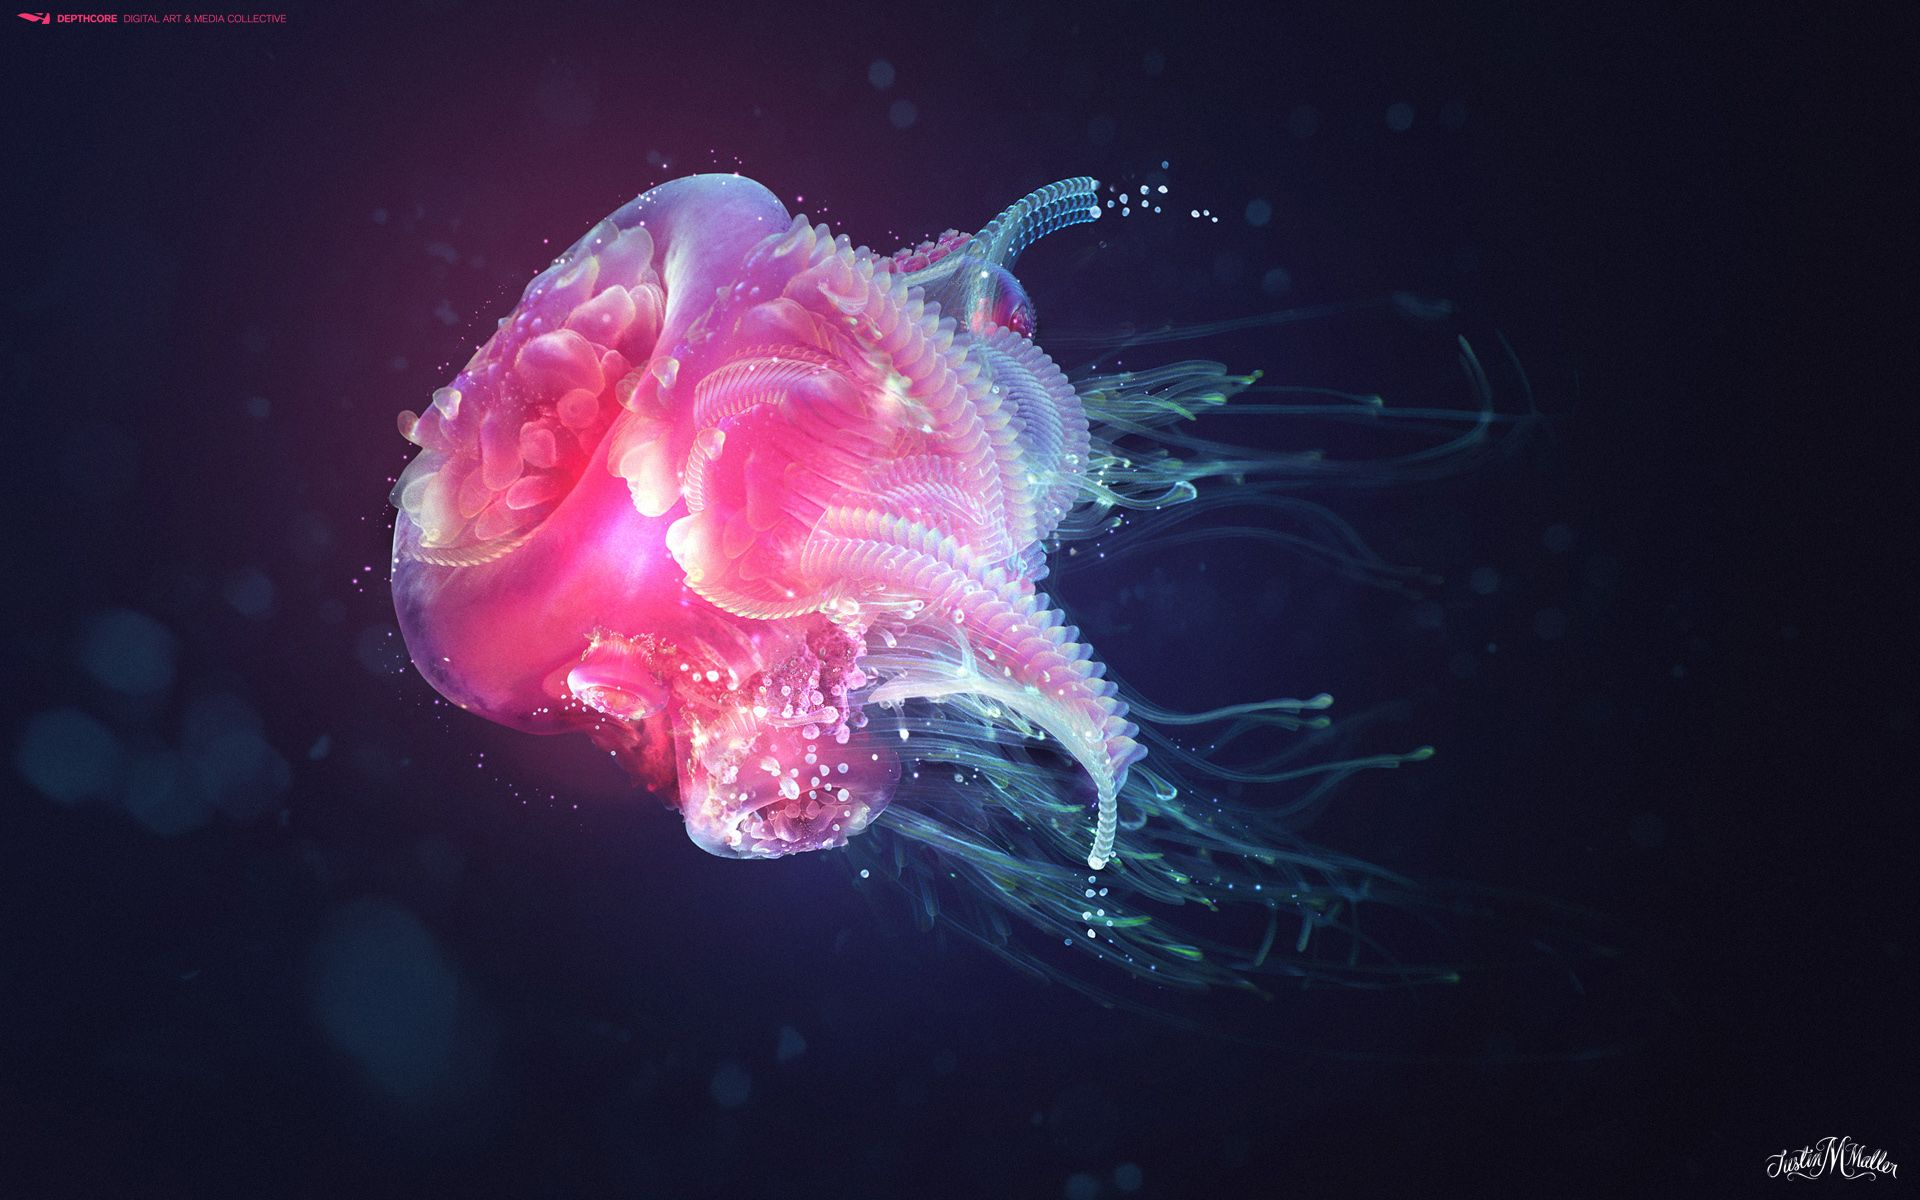 Jellyfish iphone wallpaper tumblr - Jellyfish Images